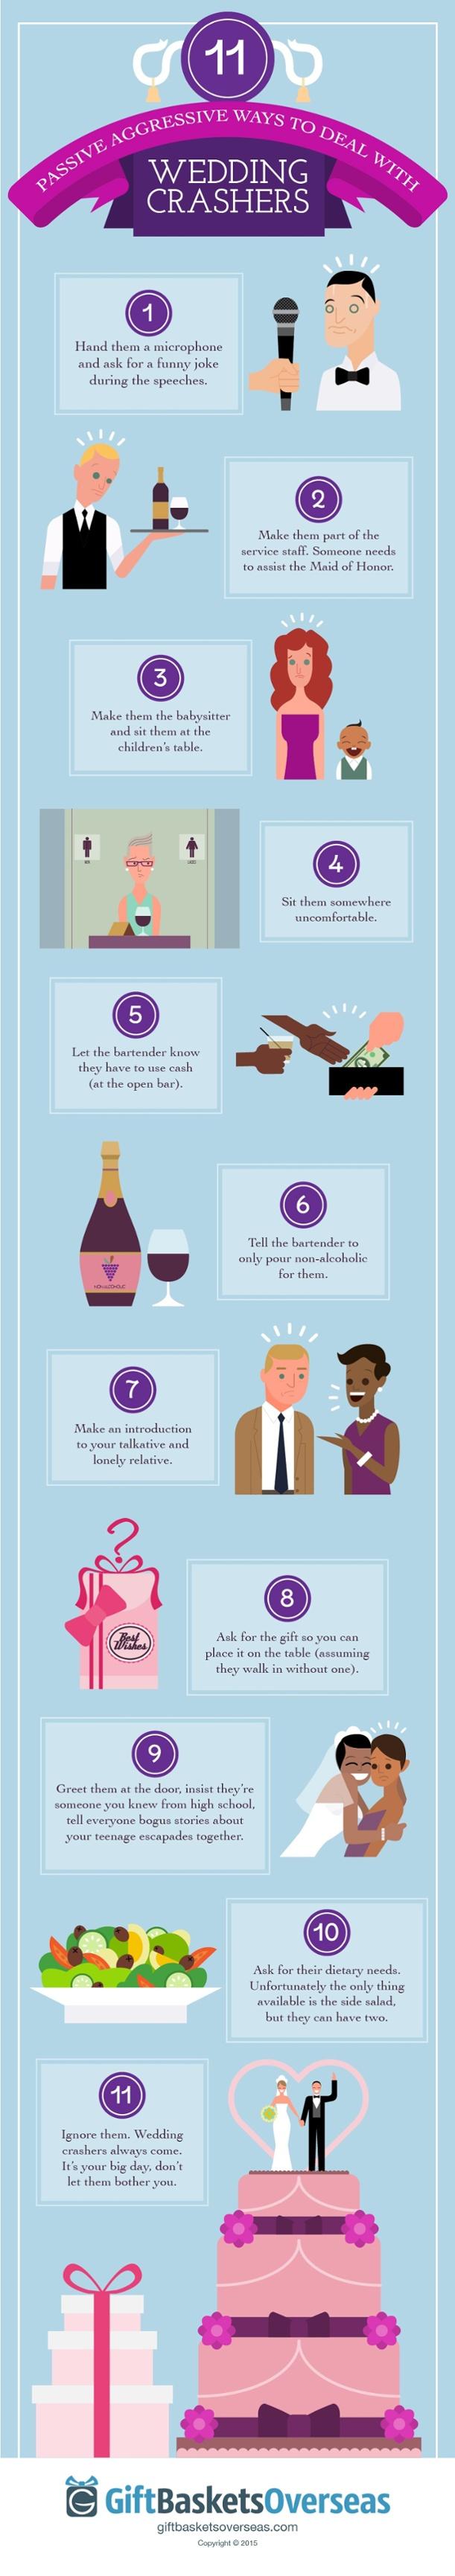 11 Ways to Deal with Wedding Crashers - Wedding Crashers - 11 Ways to Deal with Uninvited Guests